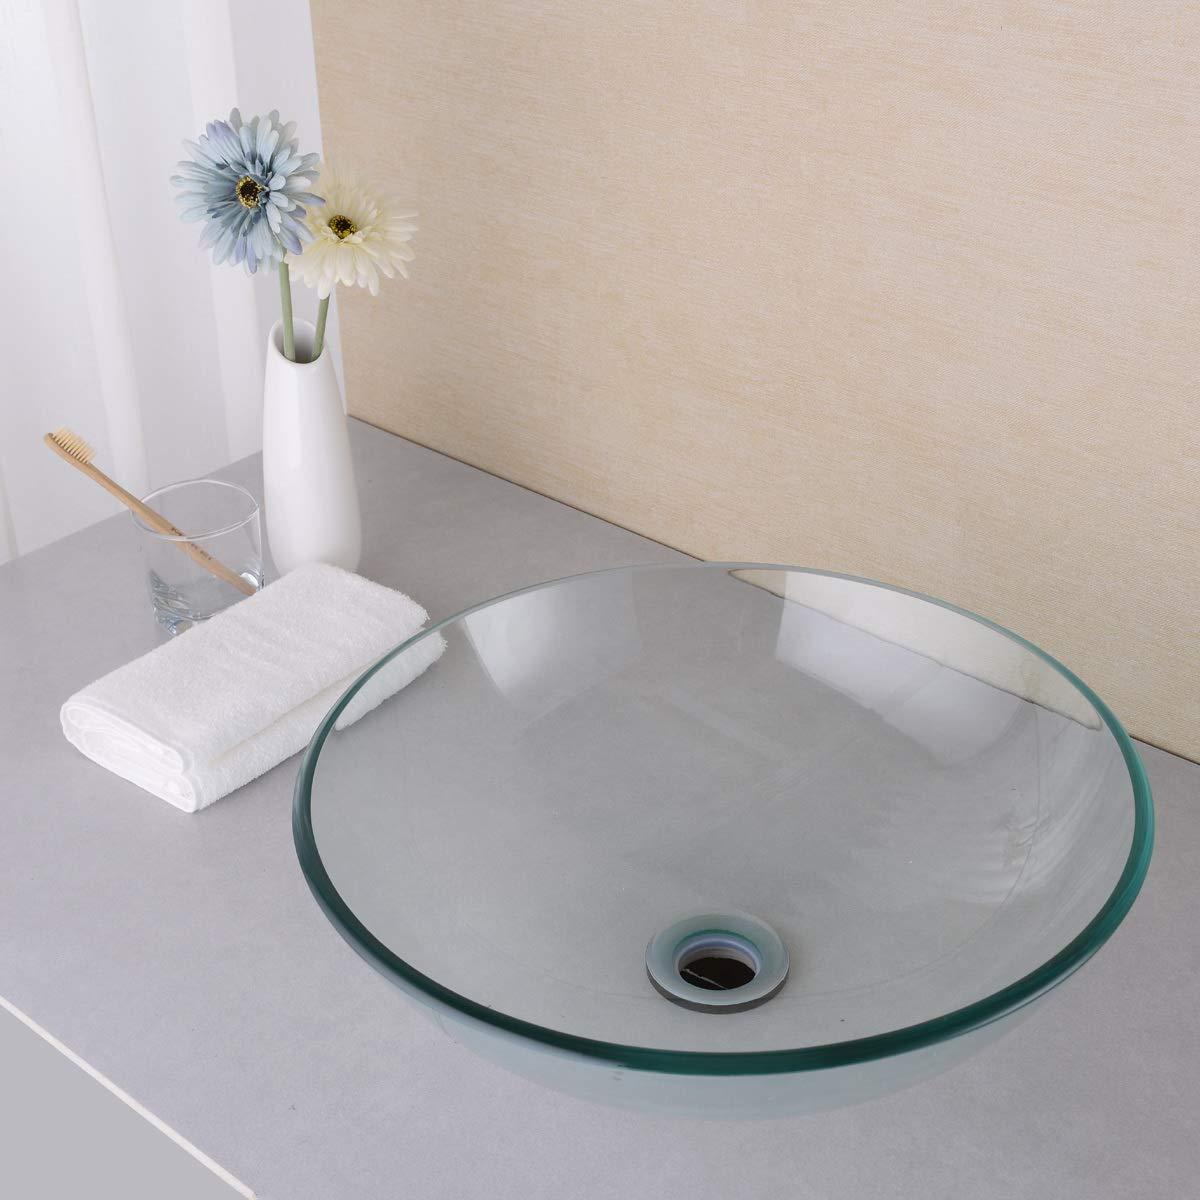 Matte Black by SINKINGDOM Bathroom Brass Mounting Ring for Vessel Sink